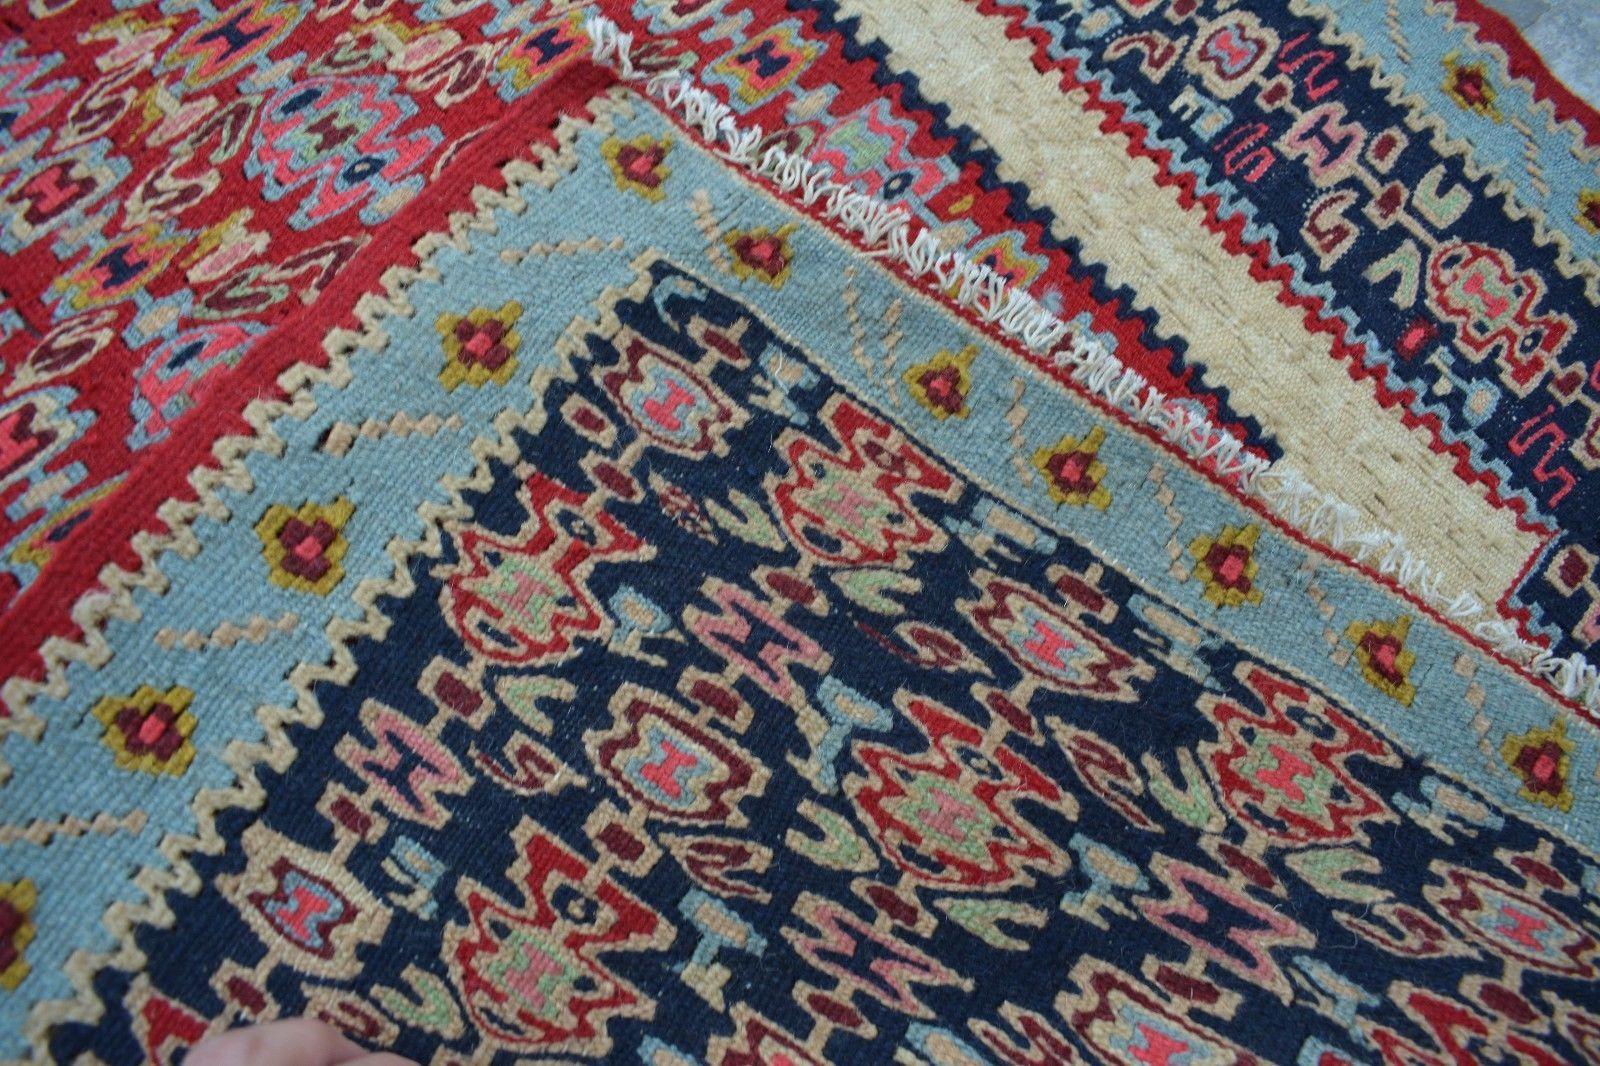 2'6 x 3'5 Ft handwoven persian tribal senneh kilim antique turkish kurdish kilem